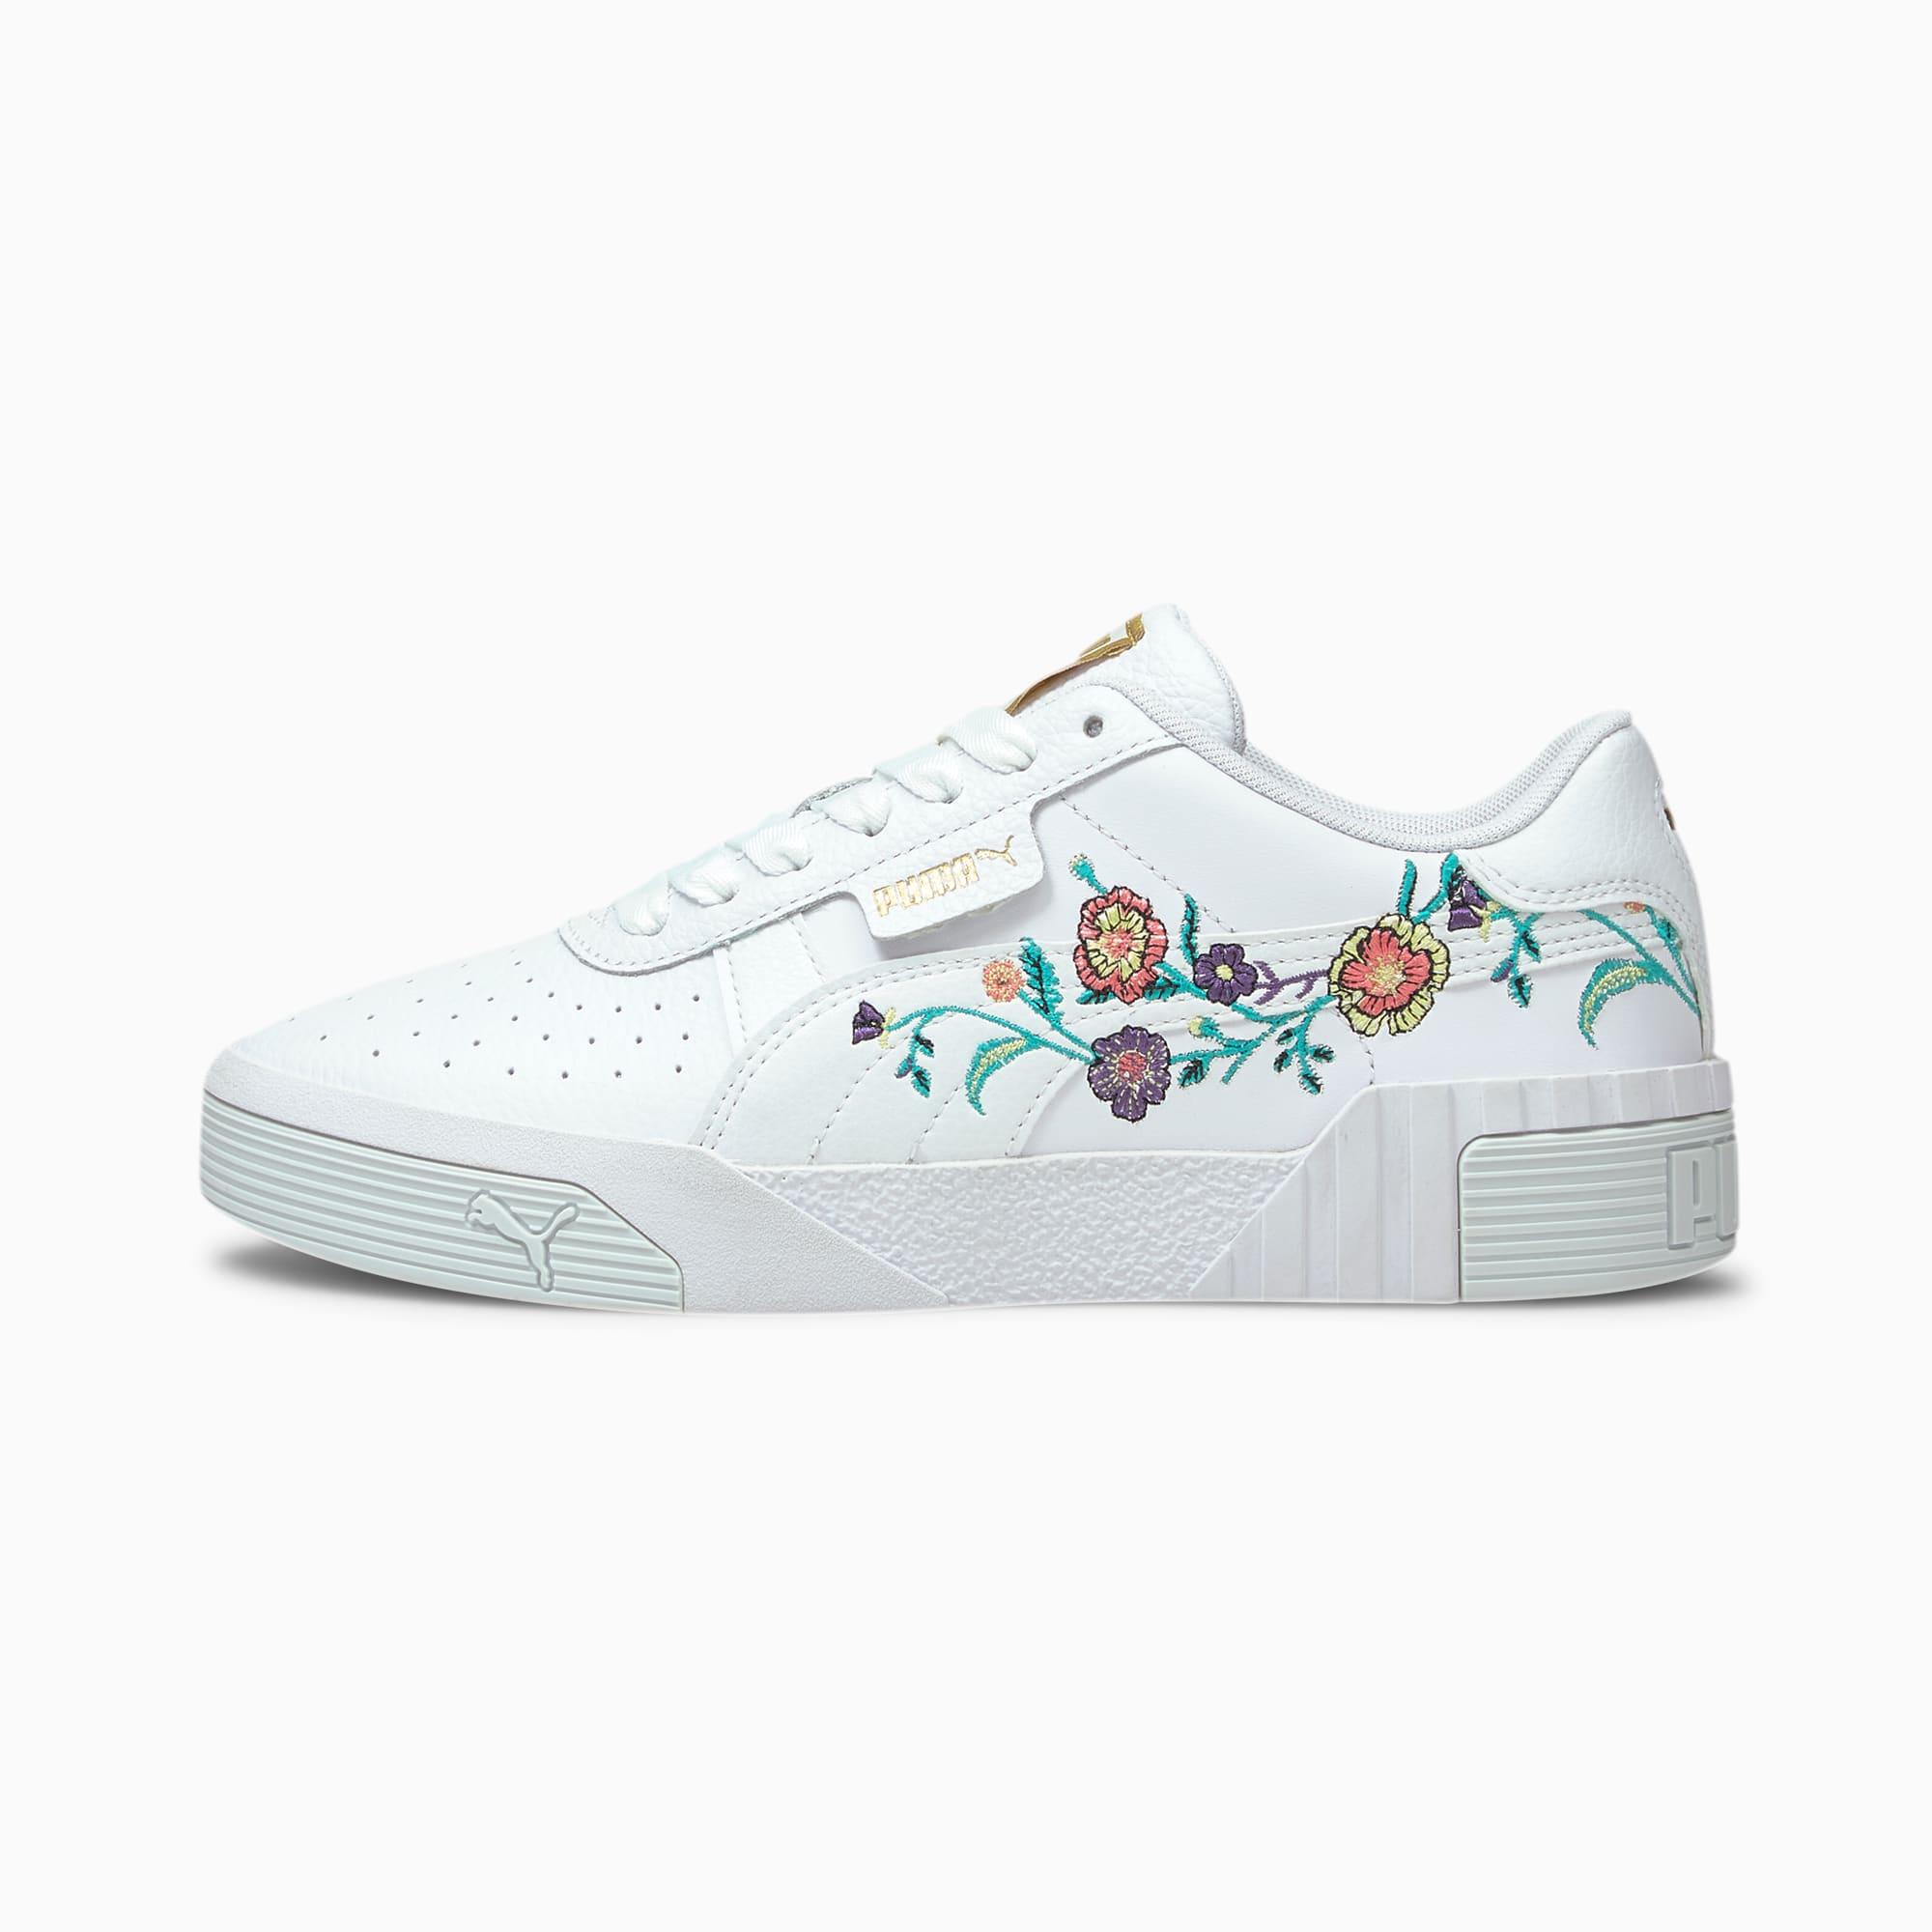 Cali Floral Women's Sneakers